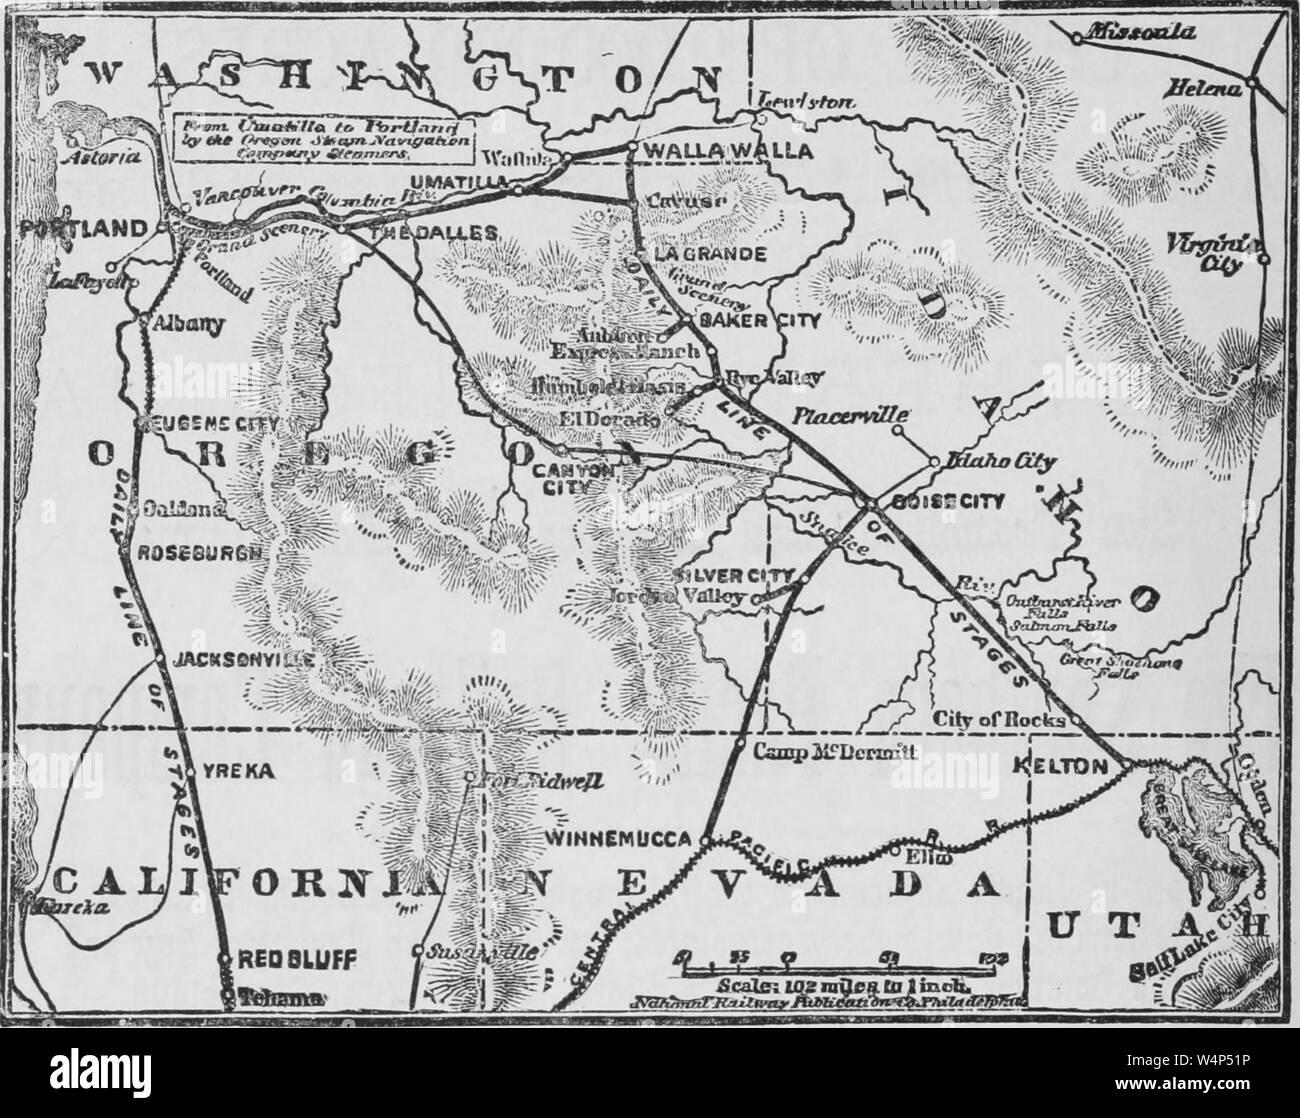 1880 Map of Colton Township Oregon and Washington Territory